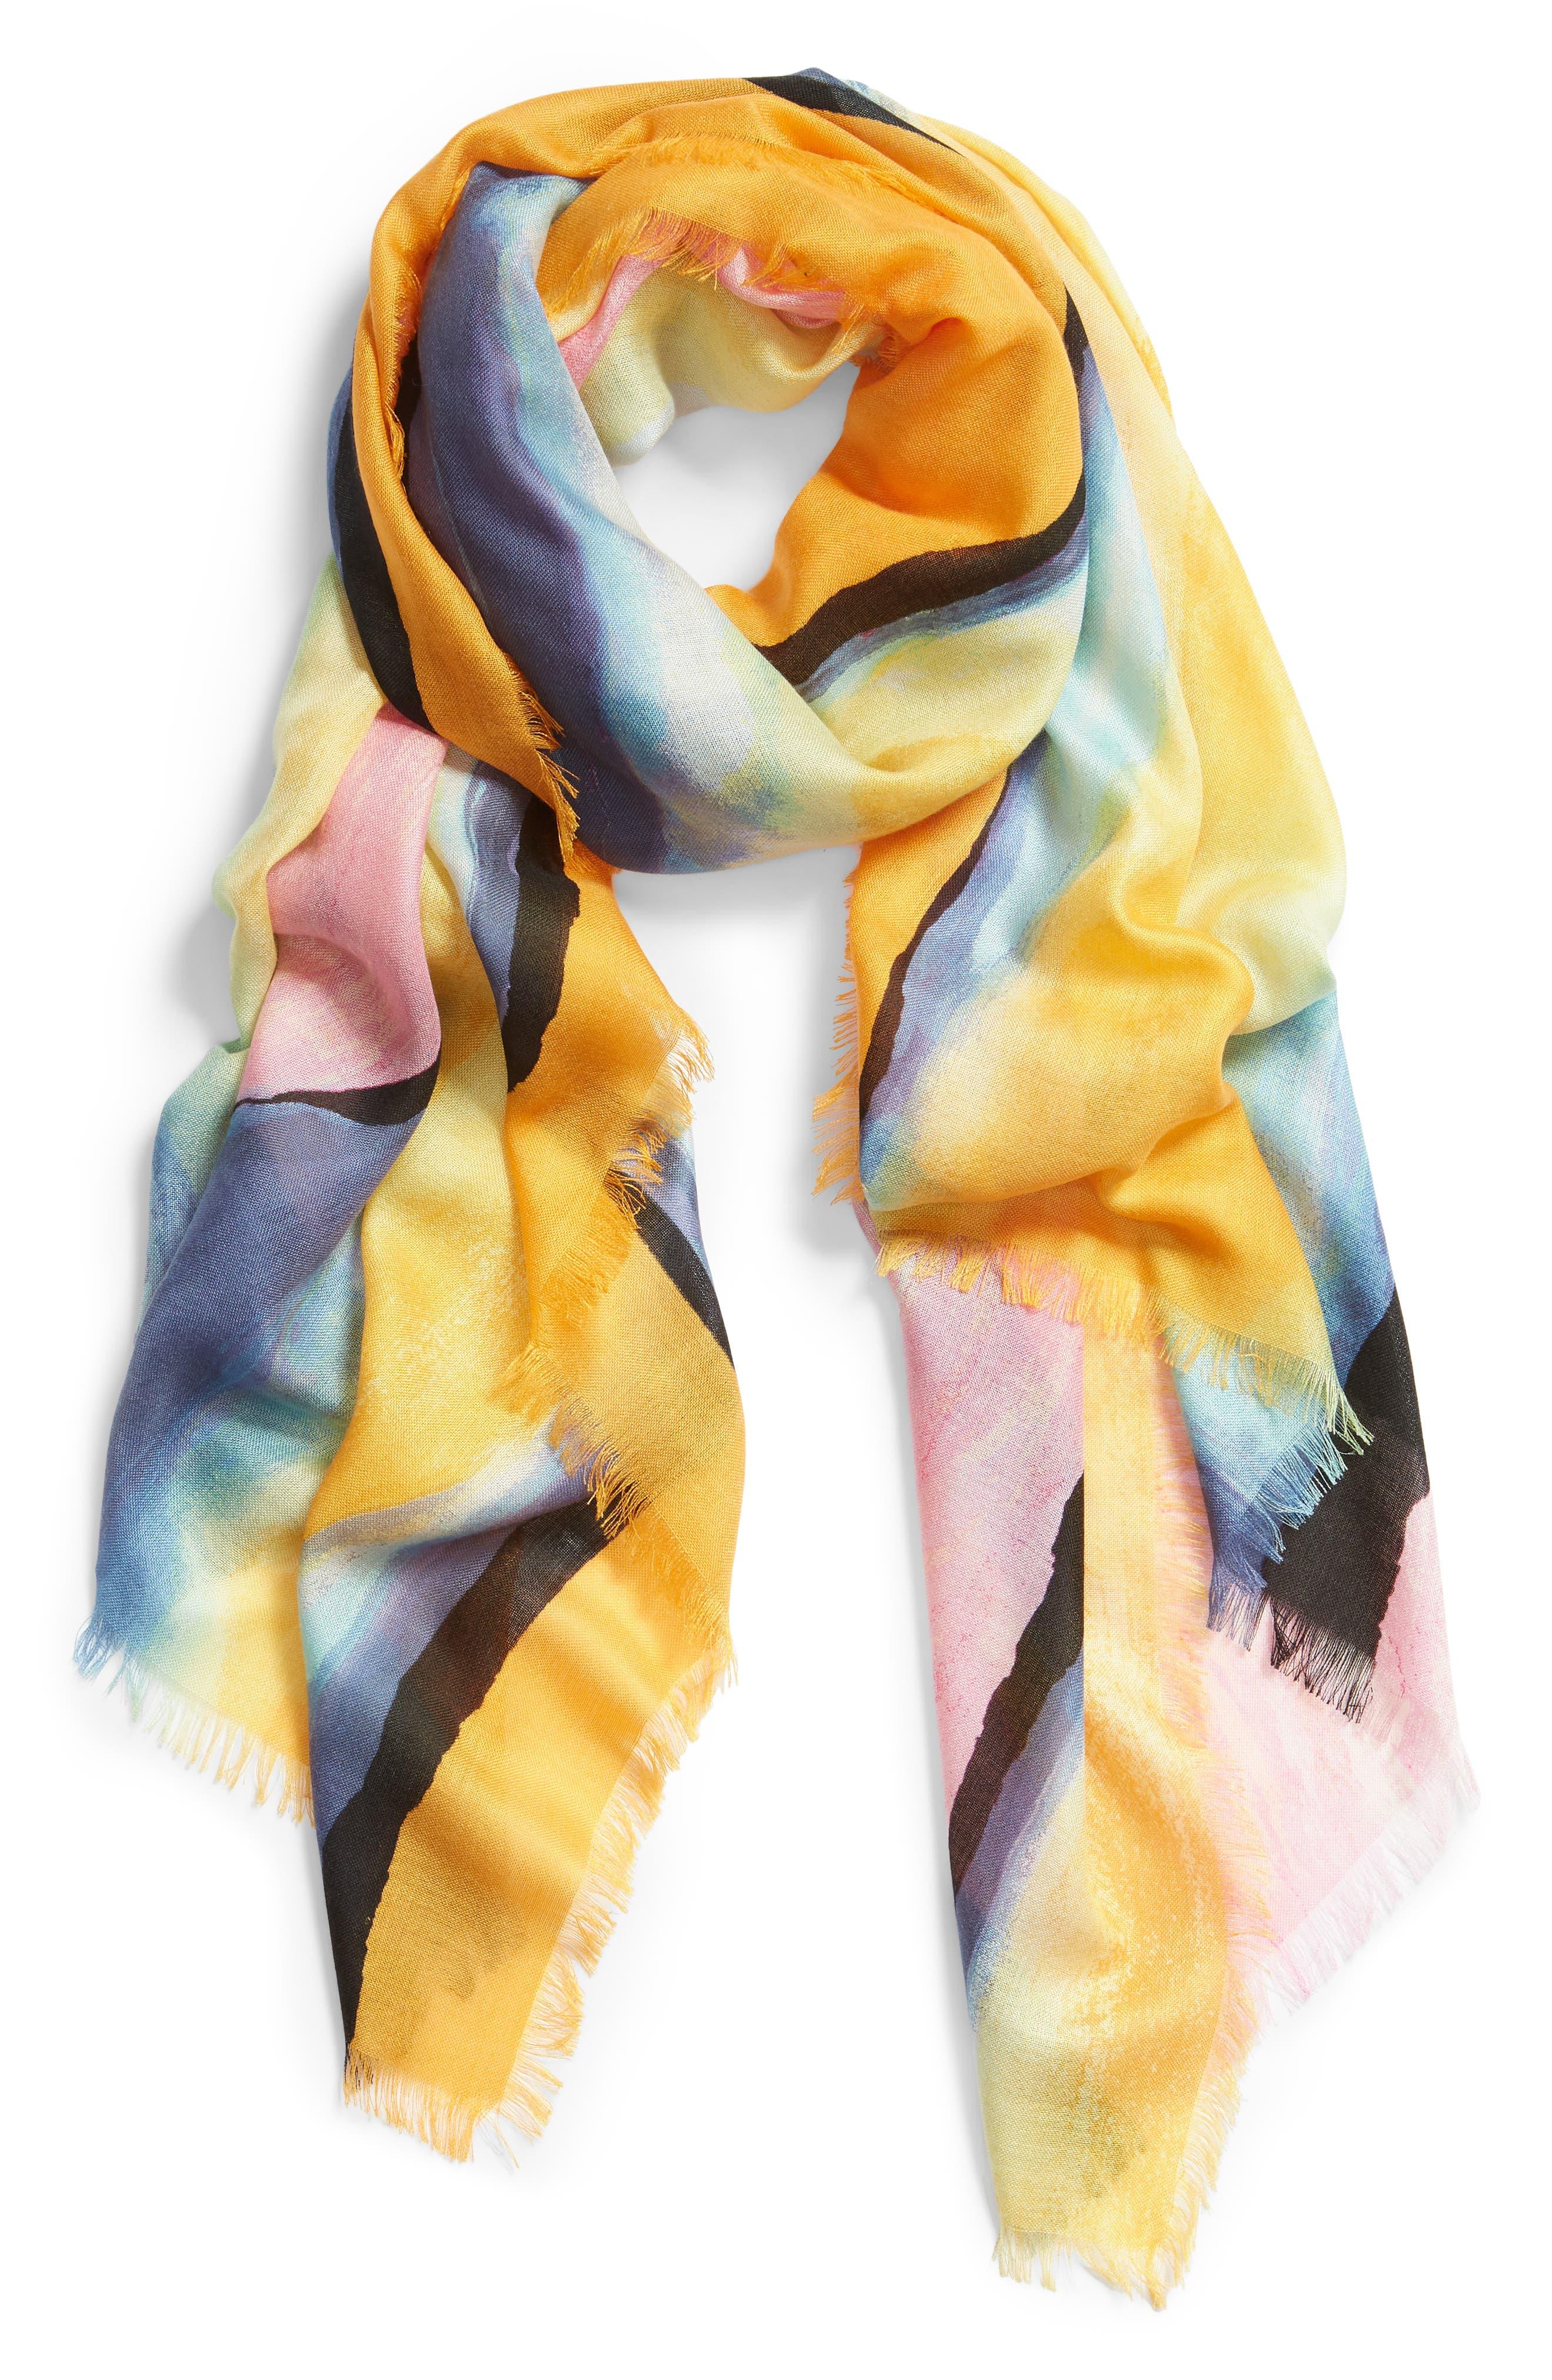 NORDSTROM,                             Eyelash Trim Print Cashmere & Silk Wrap,                             Alternate thumbnail 2, color,                             PINK PAINT STRIPE PRINT